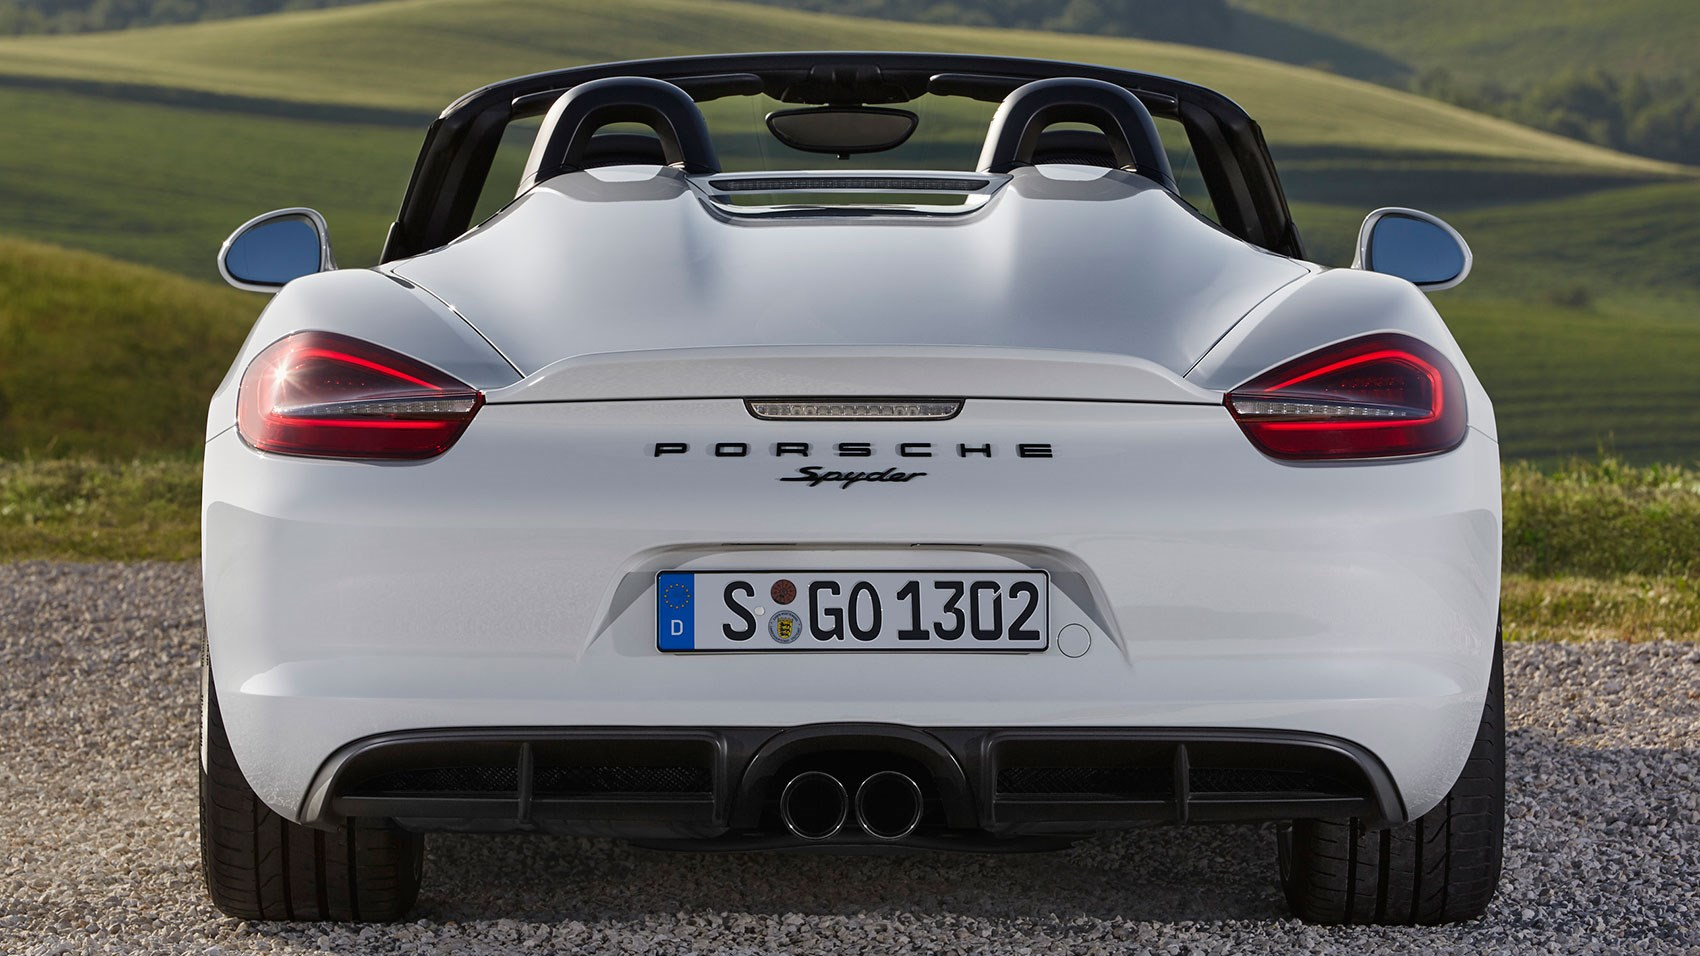 Porsche Boxster Spyder 2015 Review Car Magazine